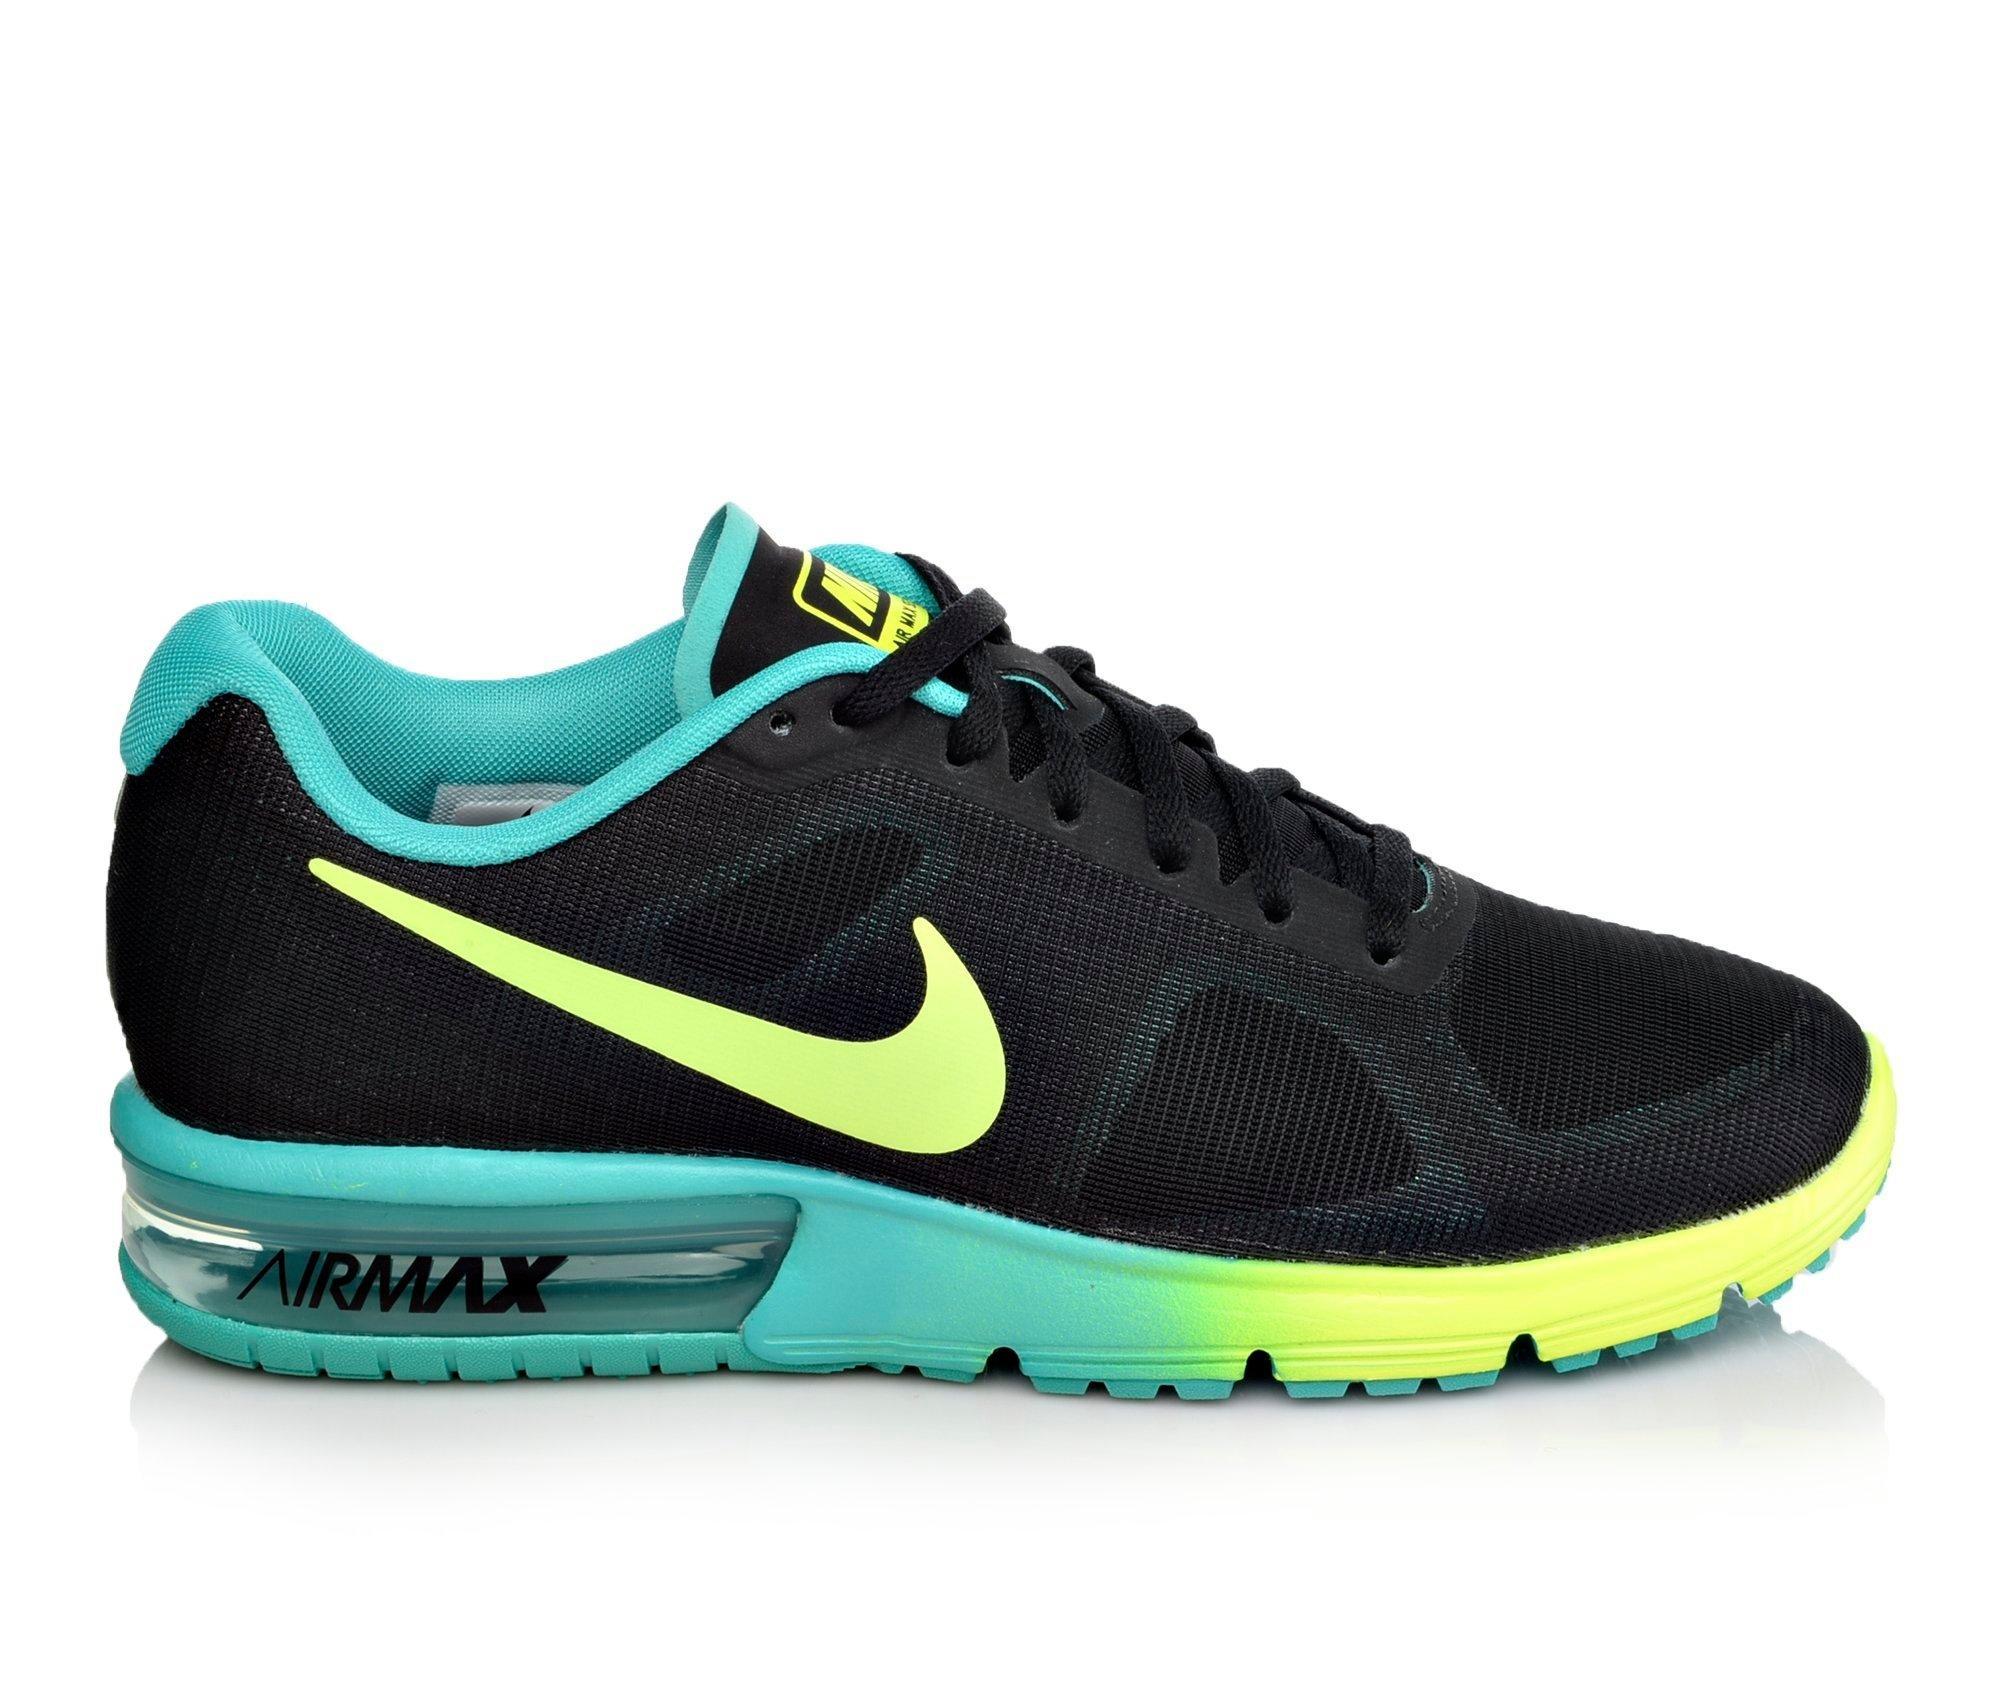 Women's Athletic Shoes | Shoe Carnival